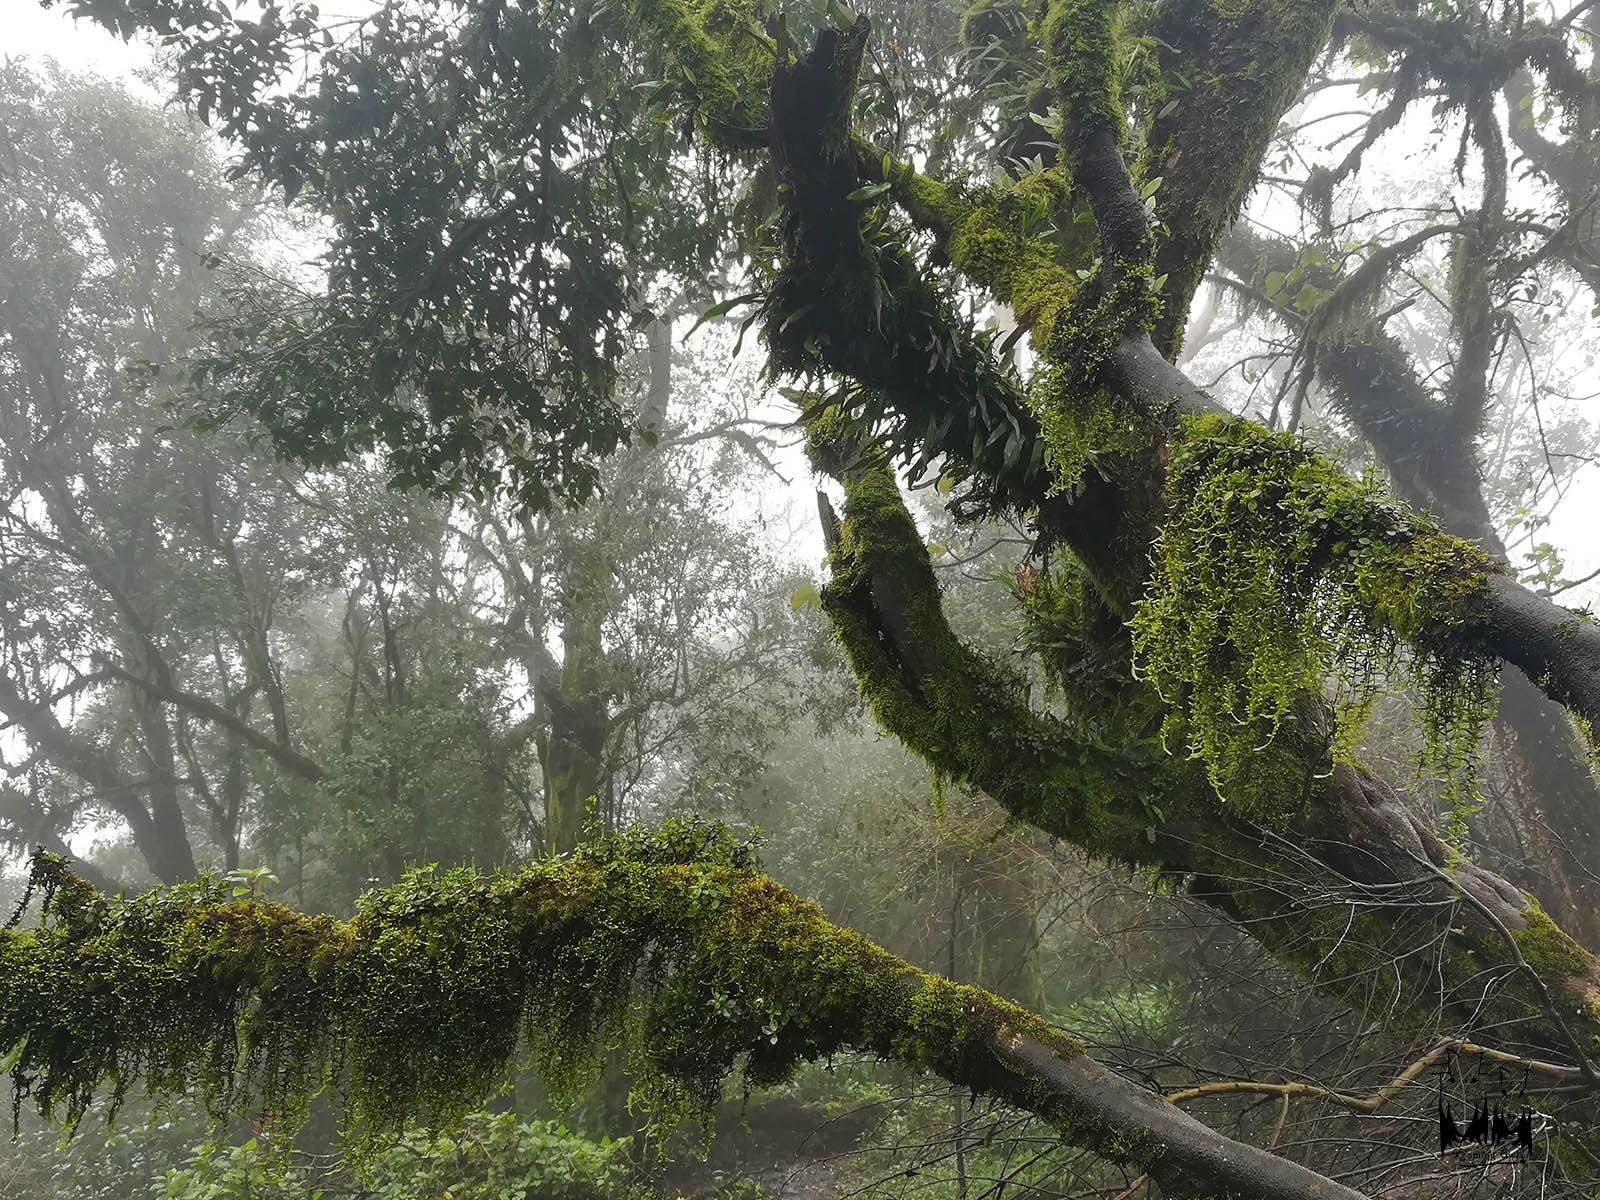 Ferns mosses gopalswamy betta,mysore bangalore tourist spot